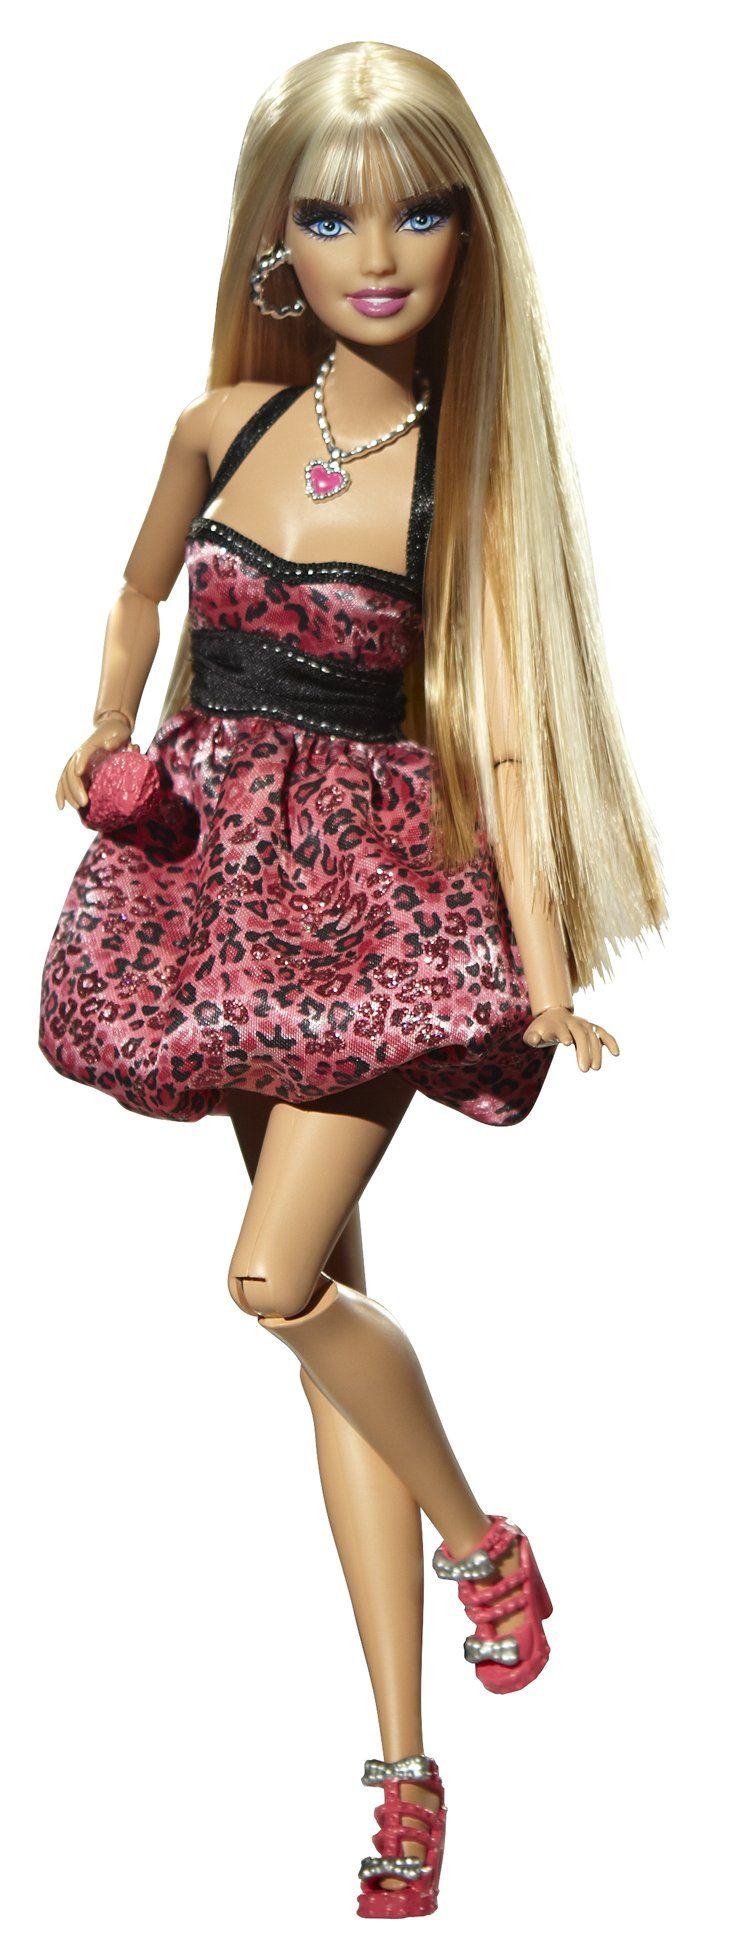 Barbie Fashionista ~ Love the Taylor Swift hair <3